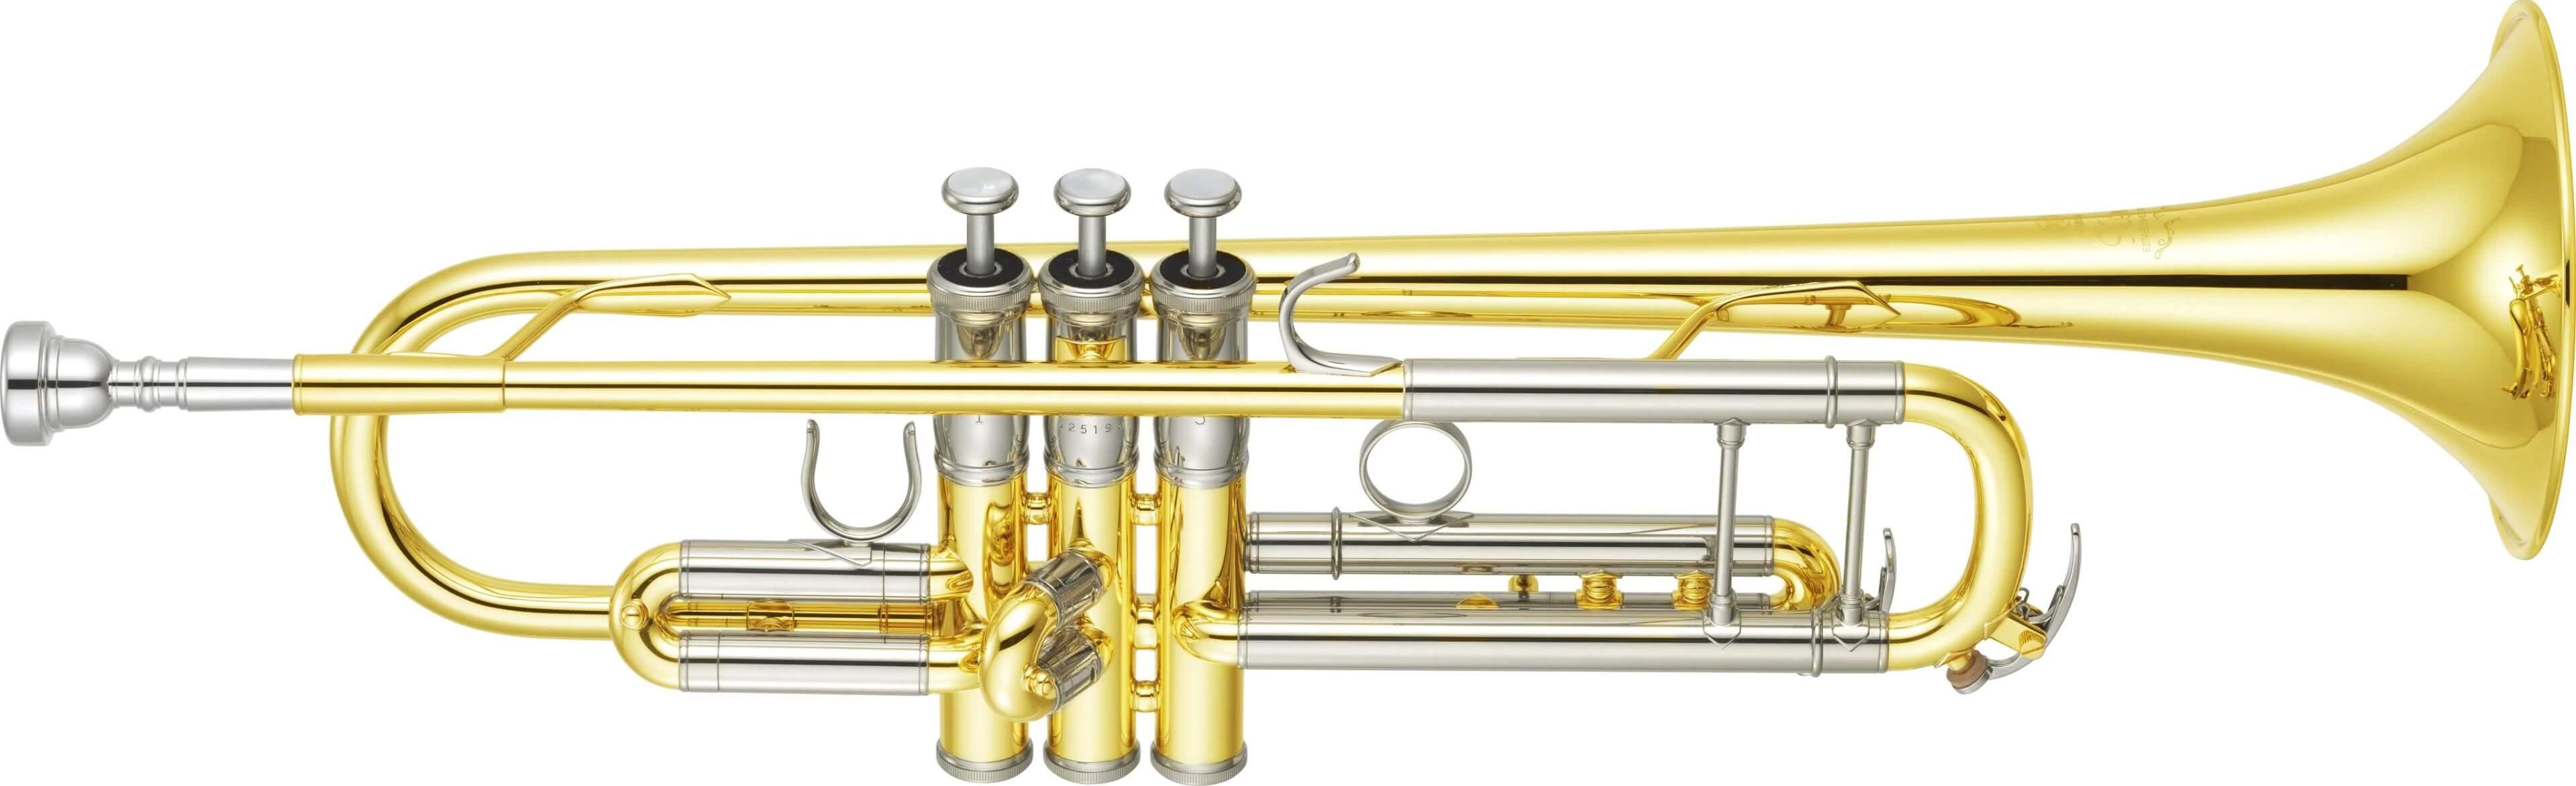 Trompeta Yamaha YTR-8335 04 Lacada